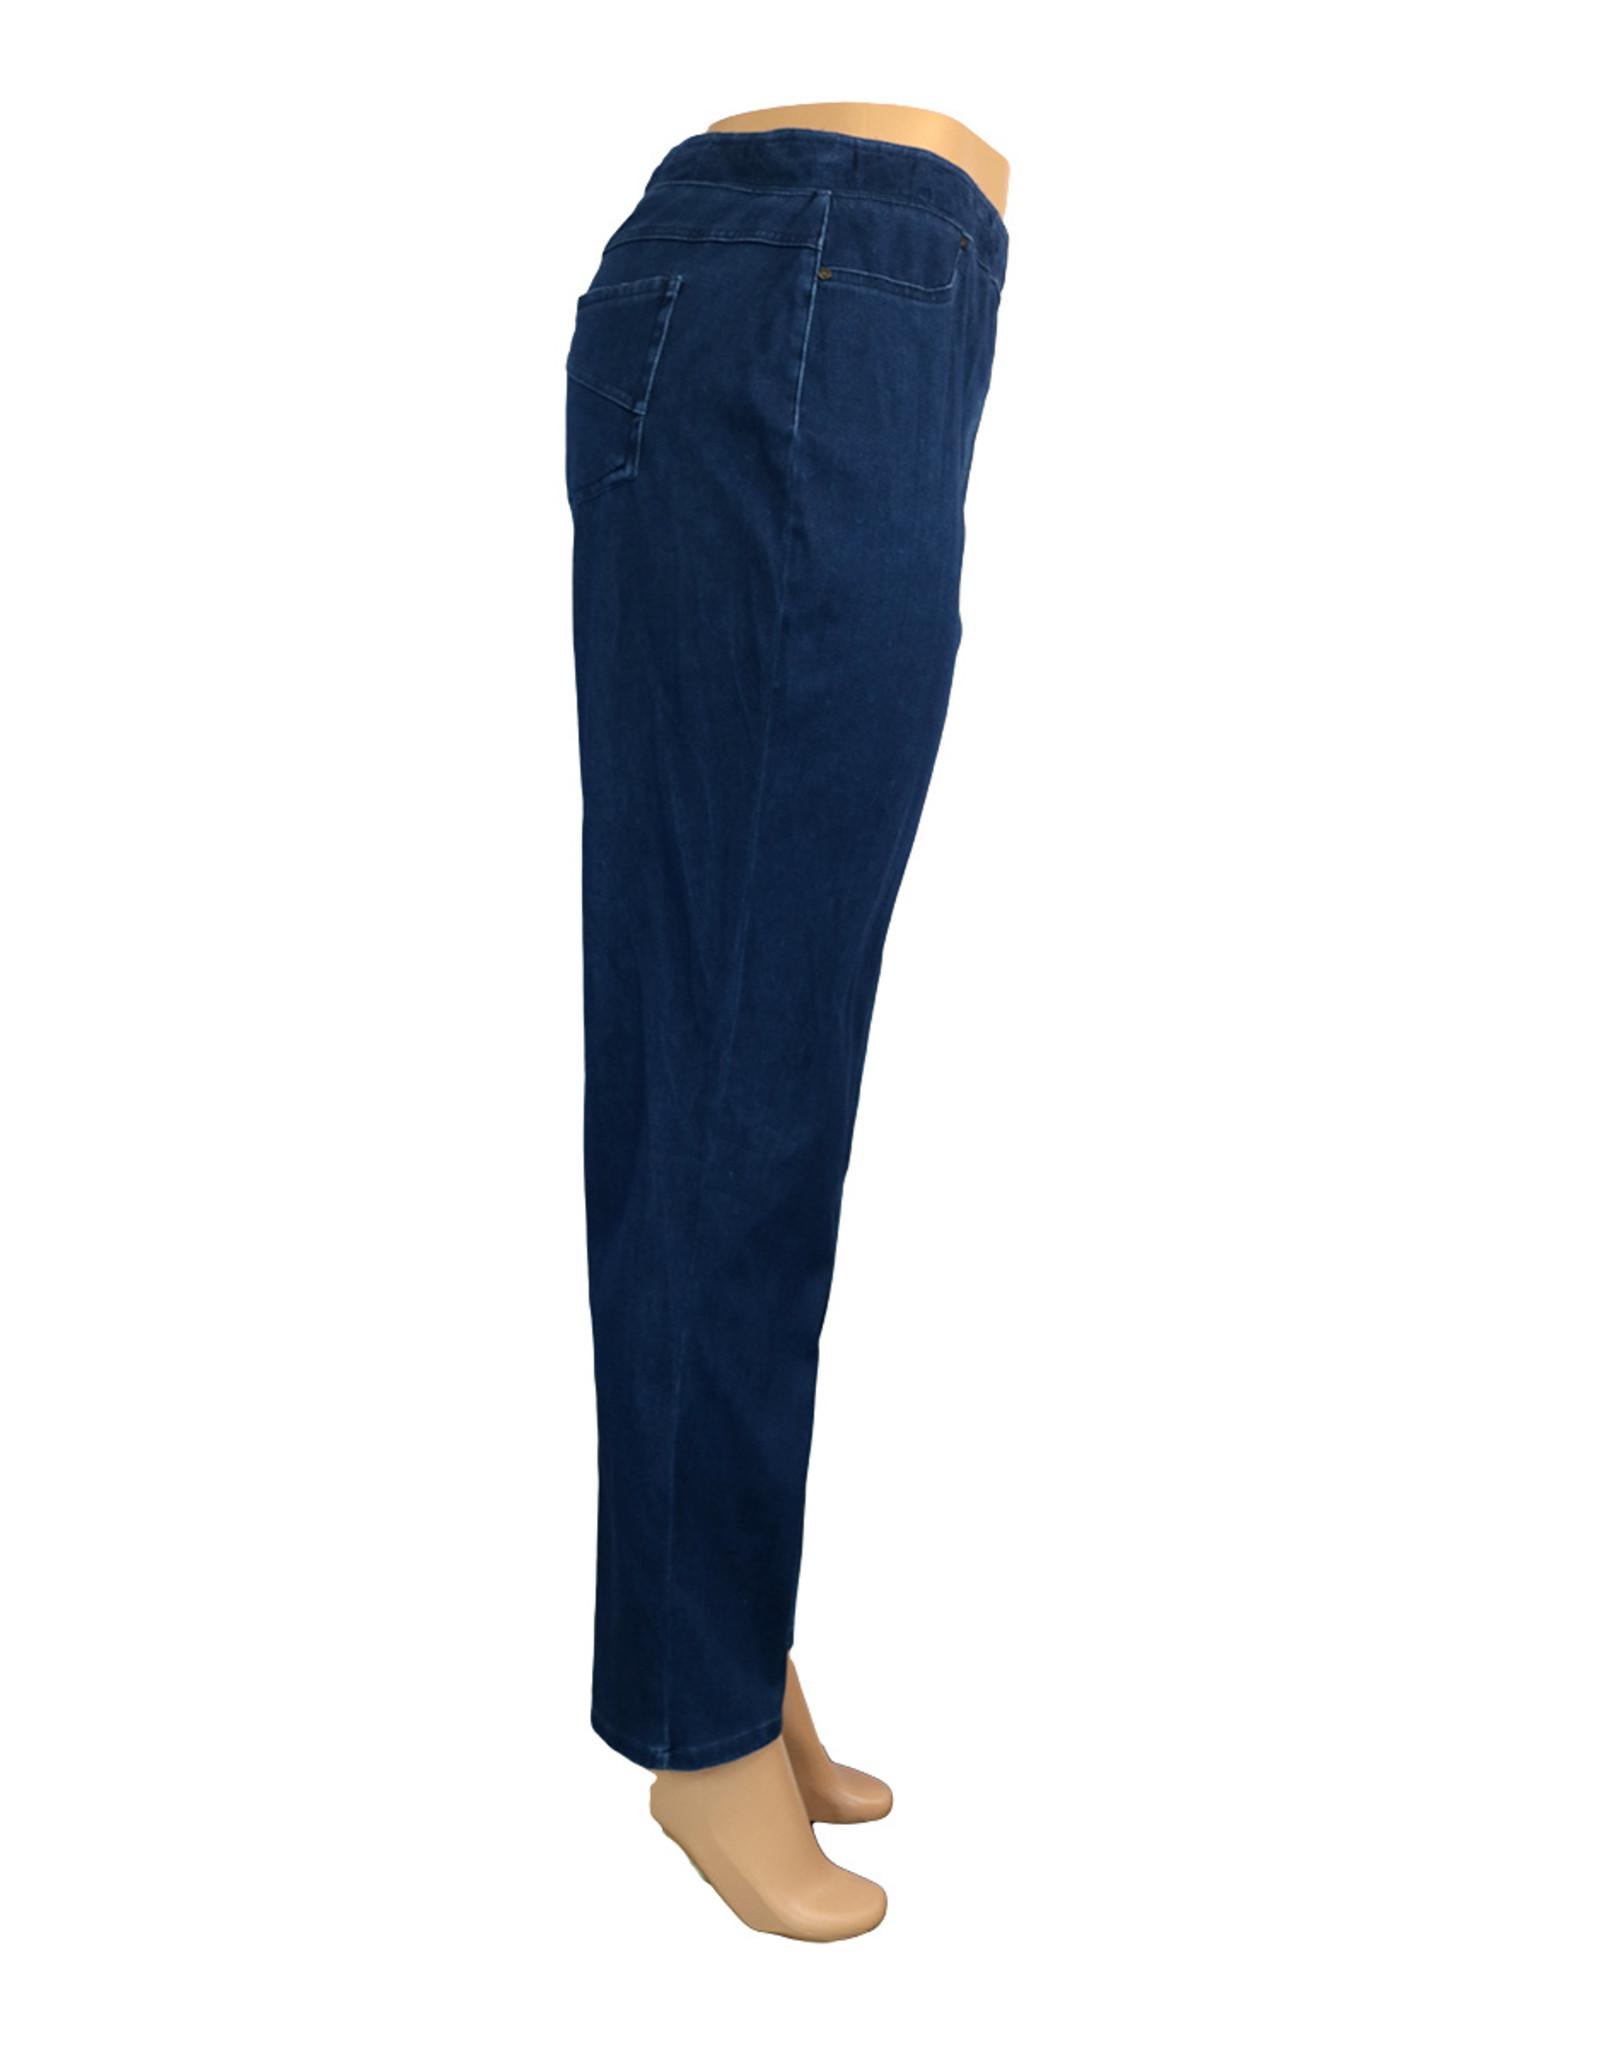 Links Stretch Denim Pants 511A (S1)